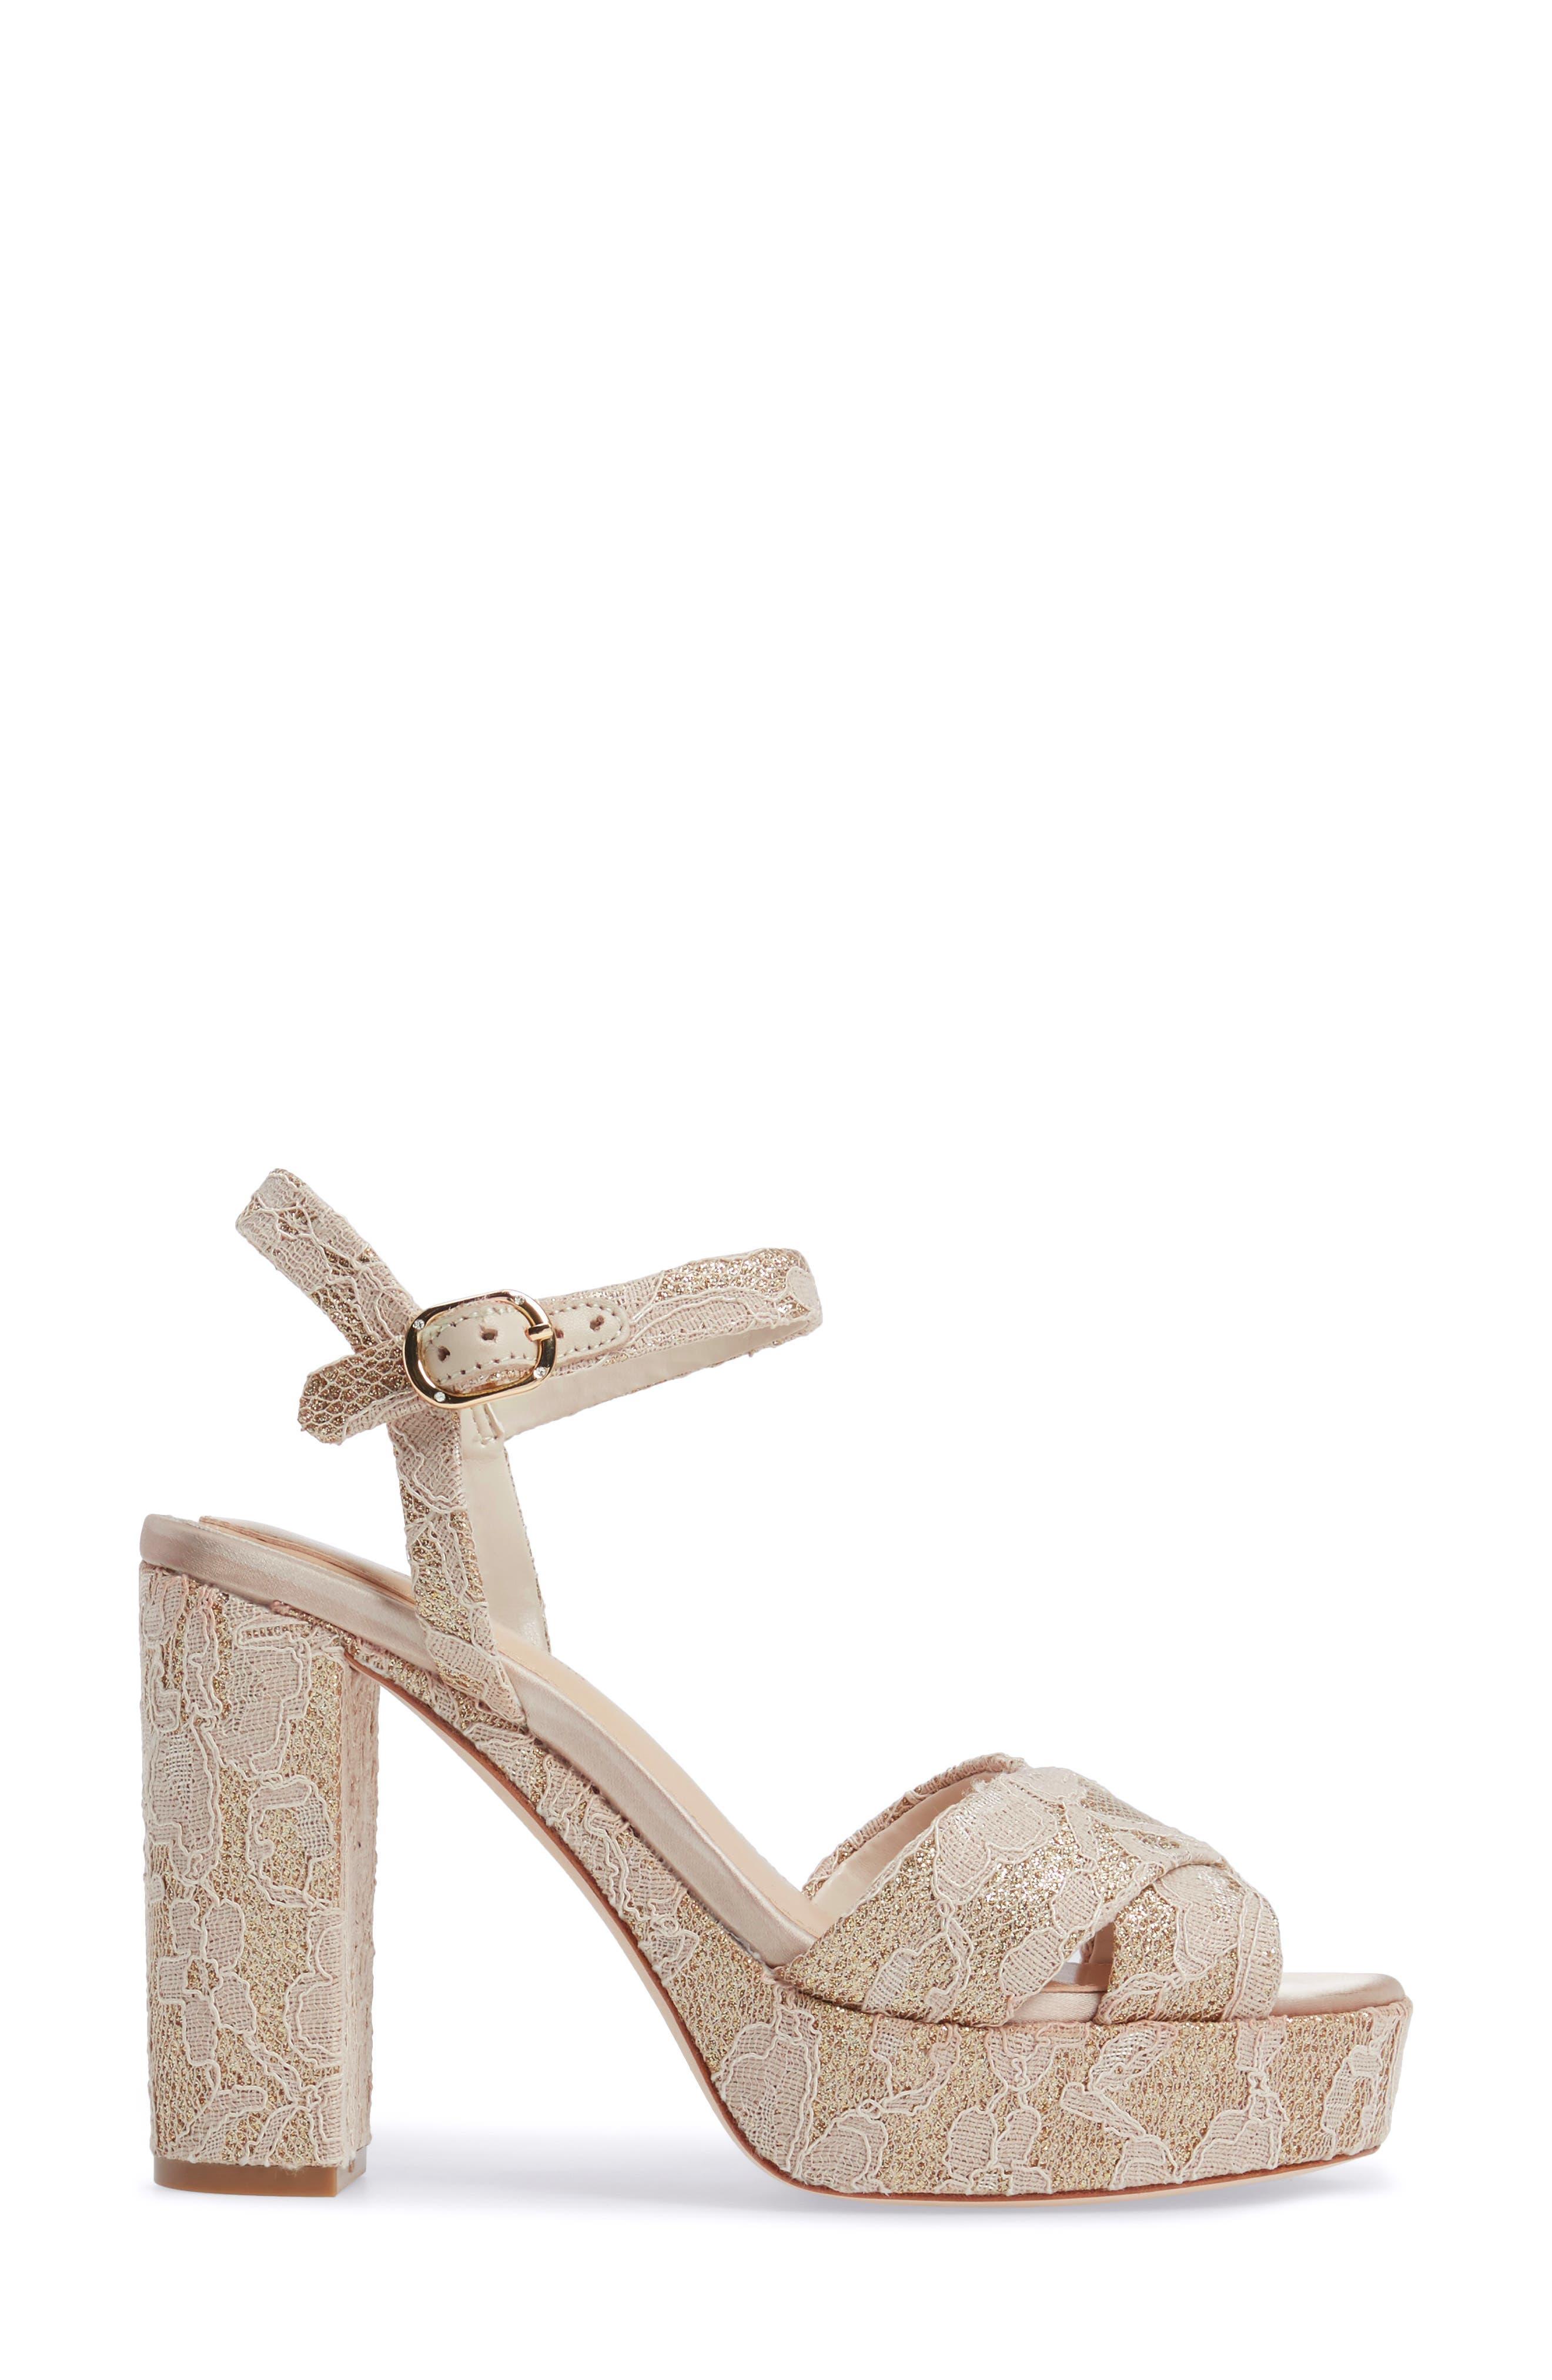 Alternate Image 3  - Imagine by Vince Camuto 'Valora' Platform Sandal (Women)